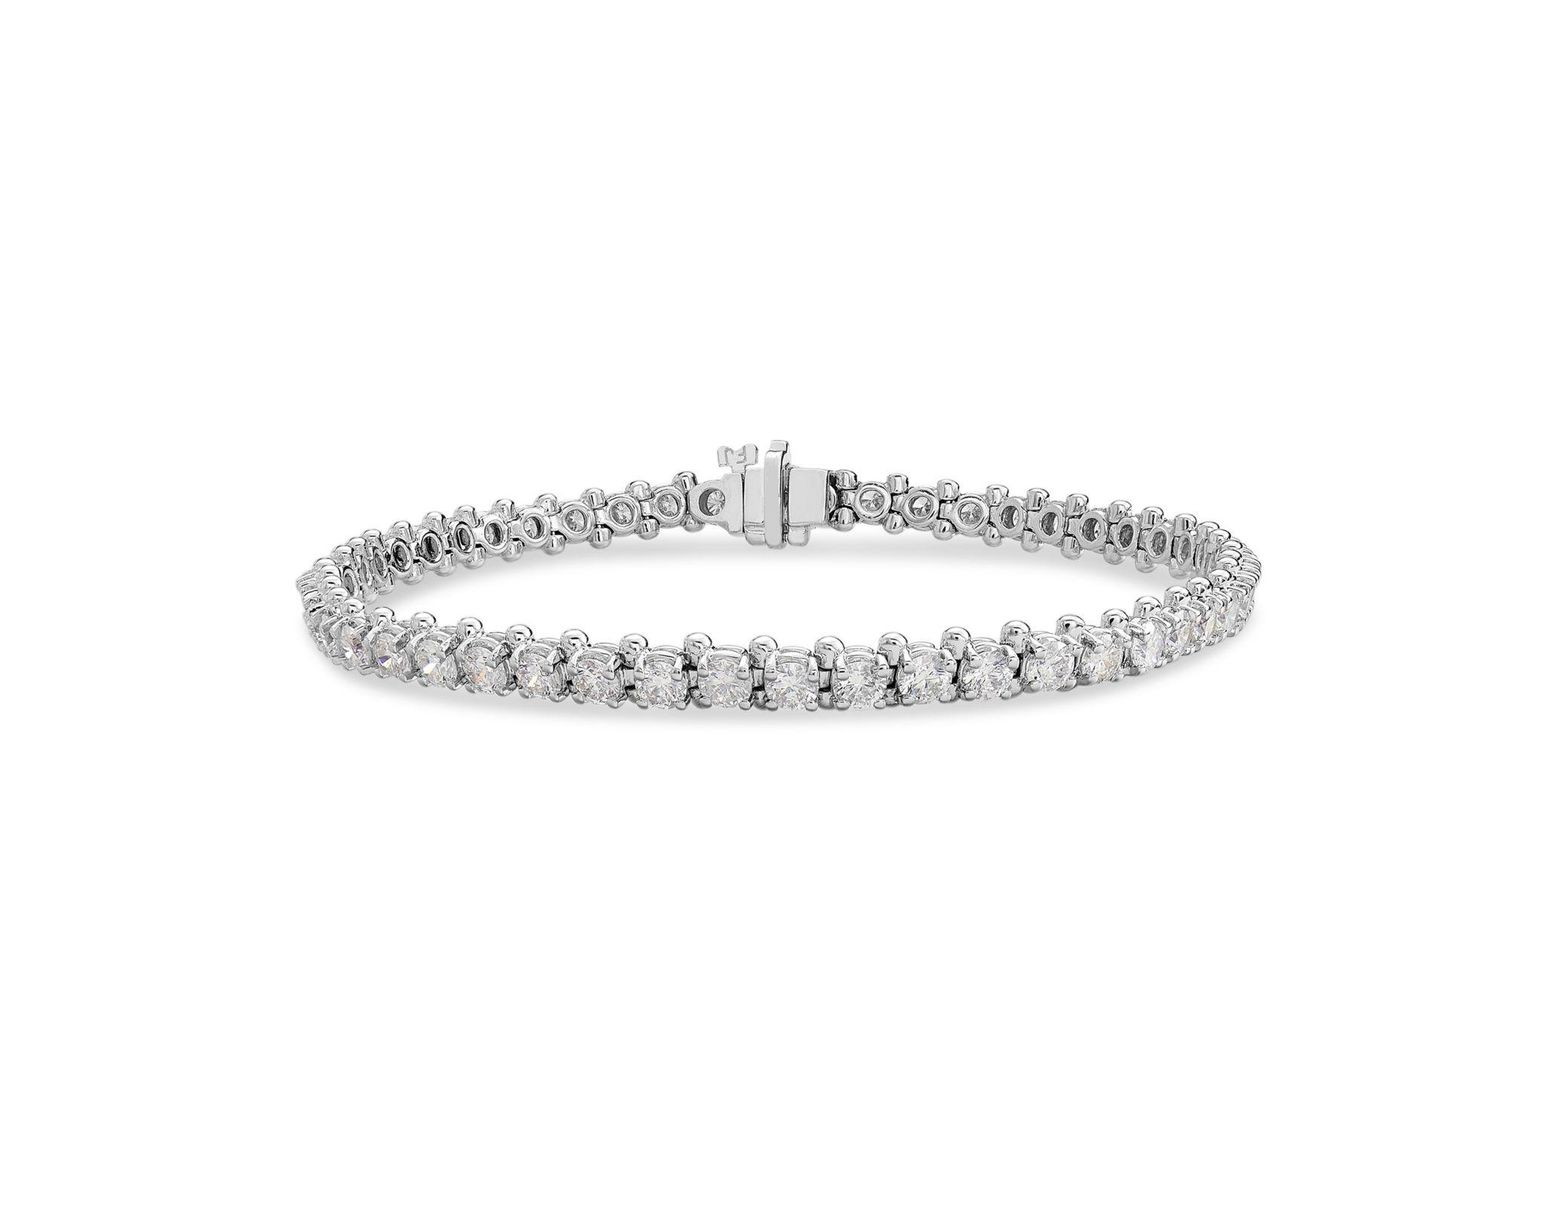 Macy S Diamond Tennis Bracelet 5 Ct T W In 14k White